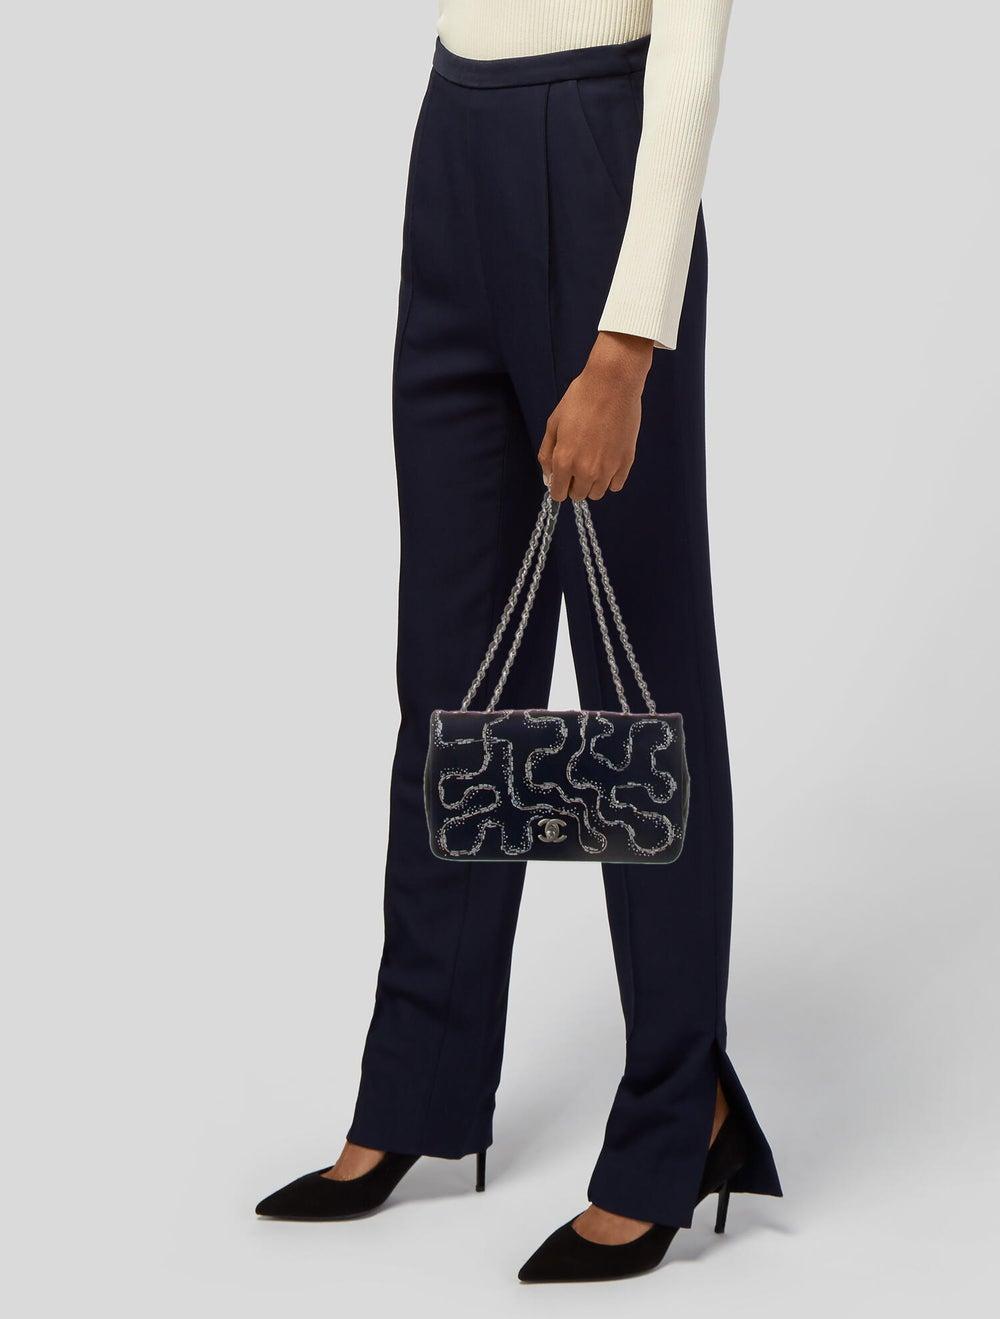 Chanel Satin LED Flap Bag Blue - image 2